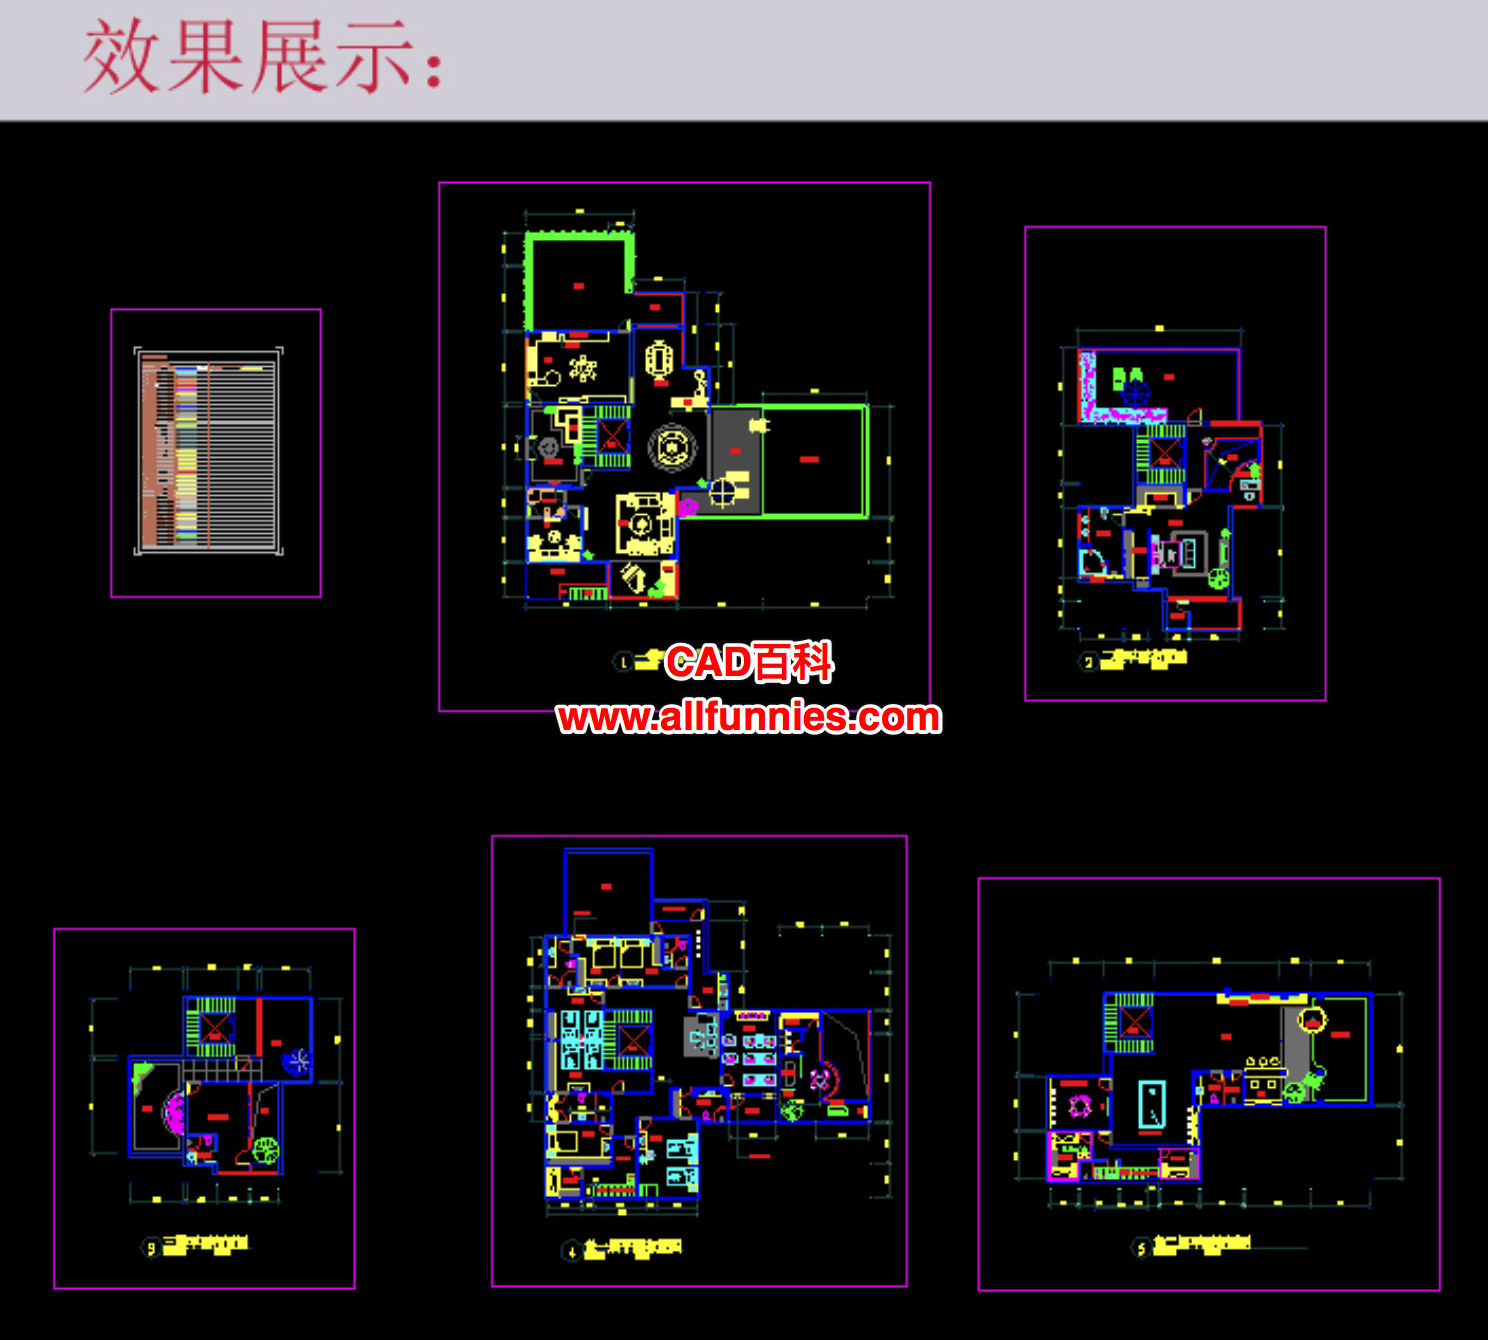 CAD批量打印图纸插件下载(支持AutoCAD2020,含安装使用教程)